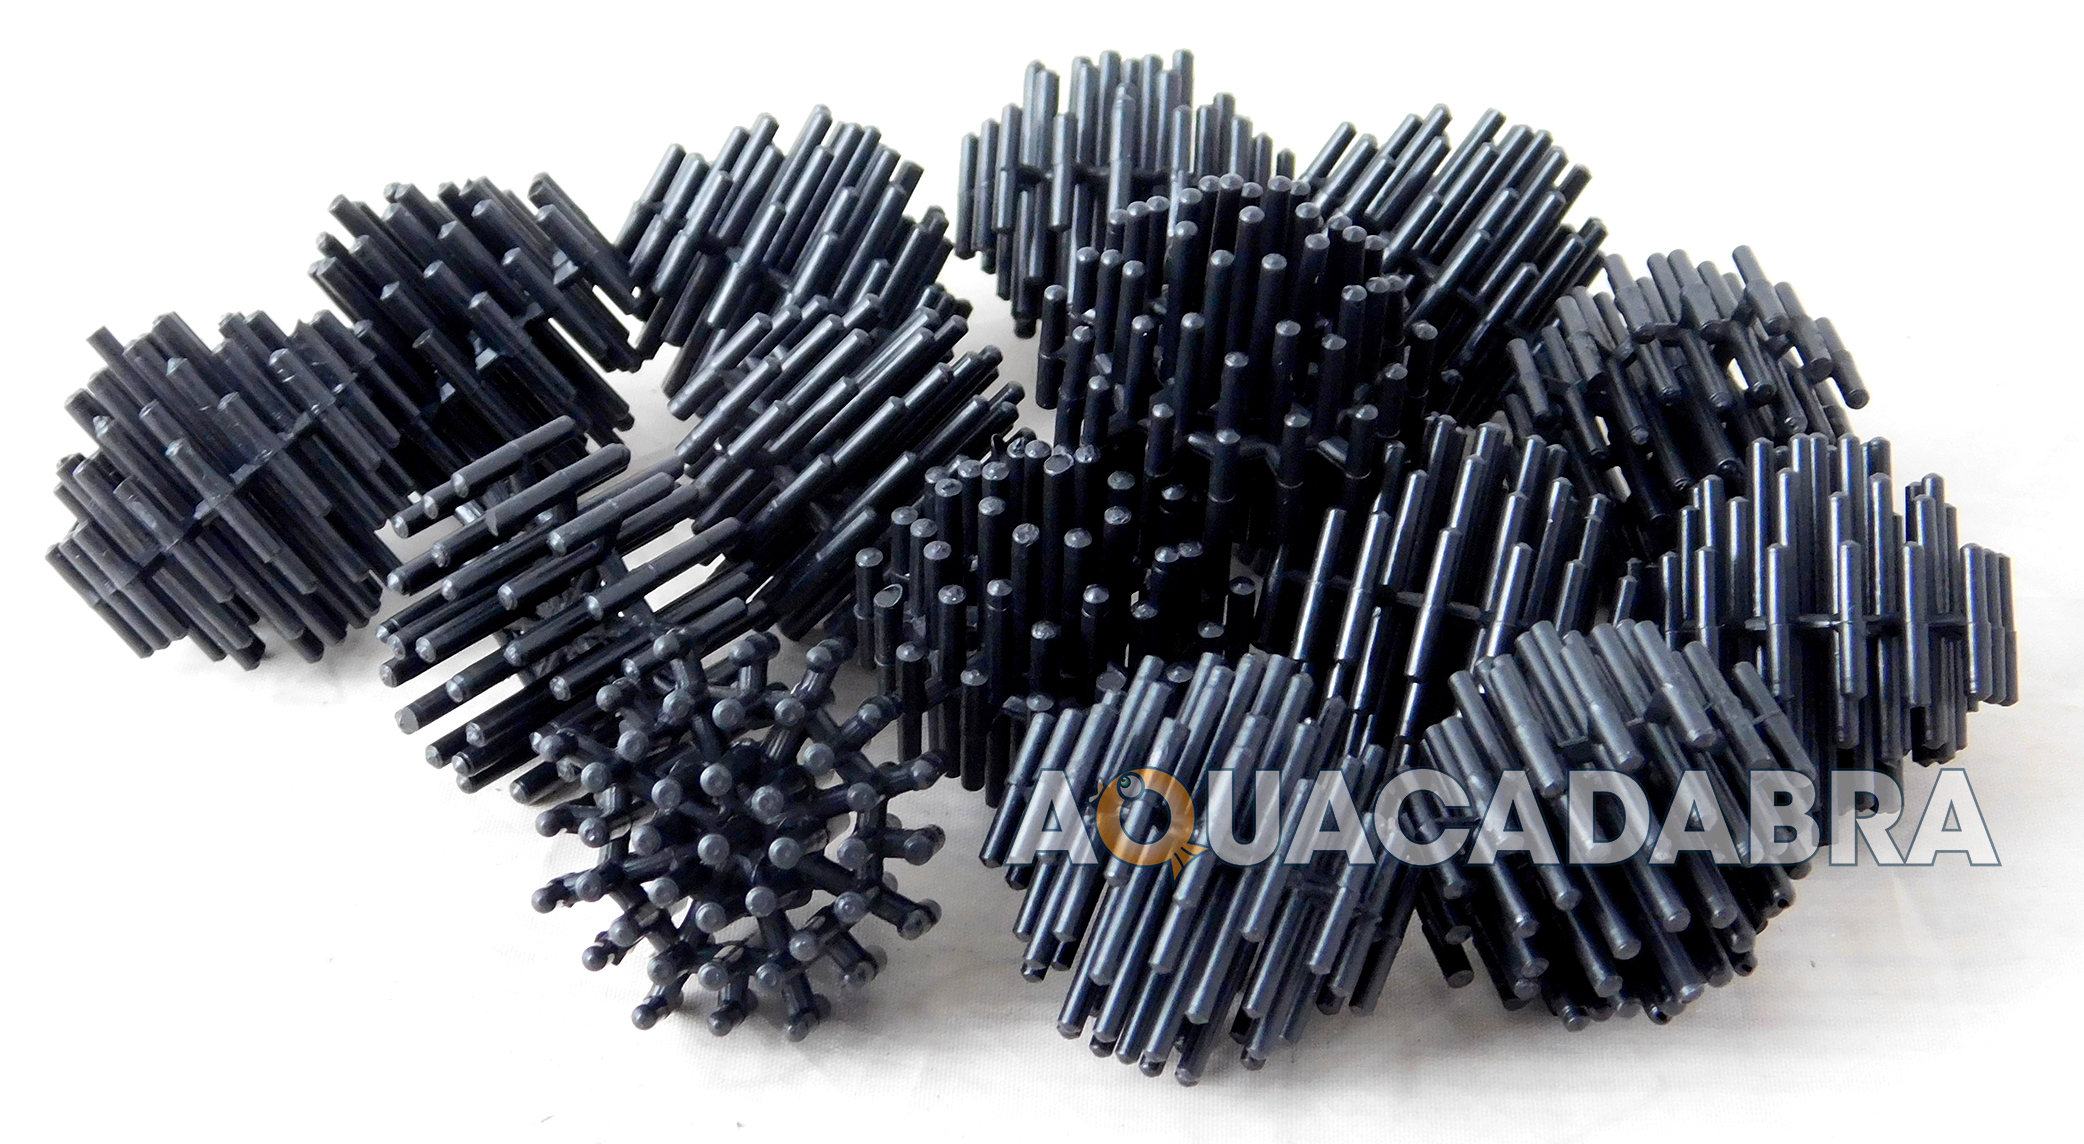 1000 bio balls sump tank filter bioballs marine reef fish for Koi pond traduzione